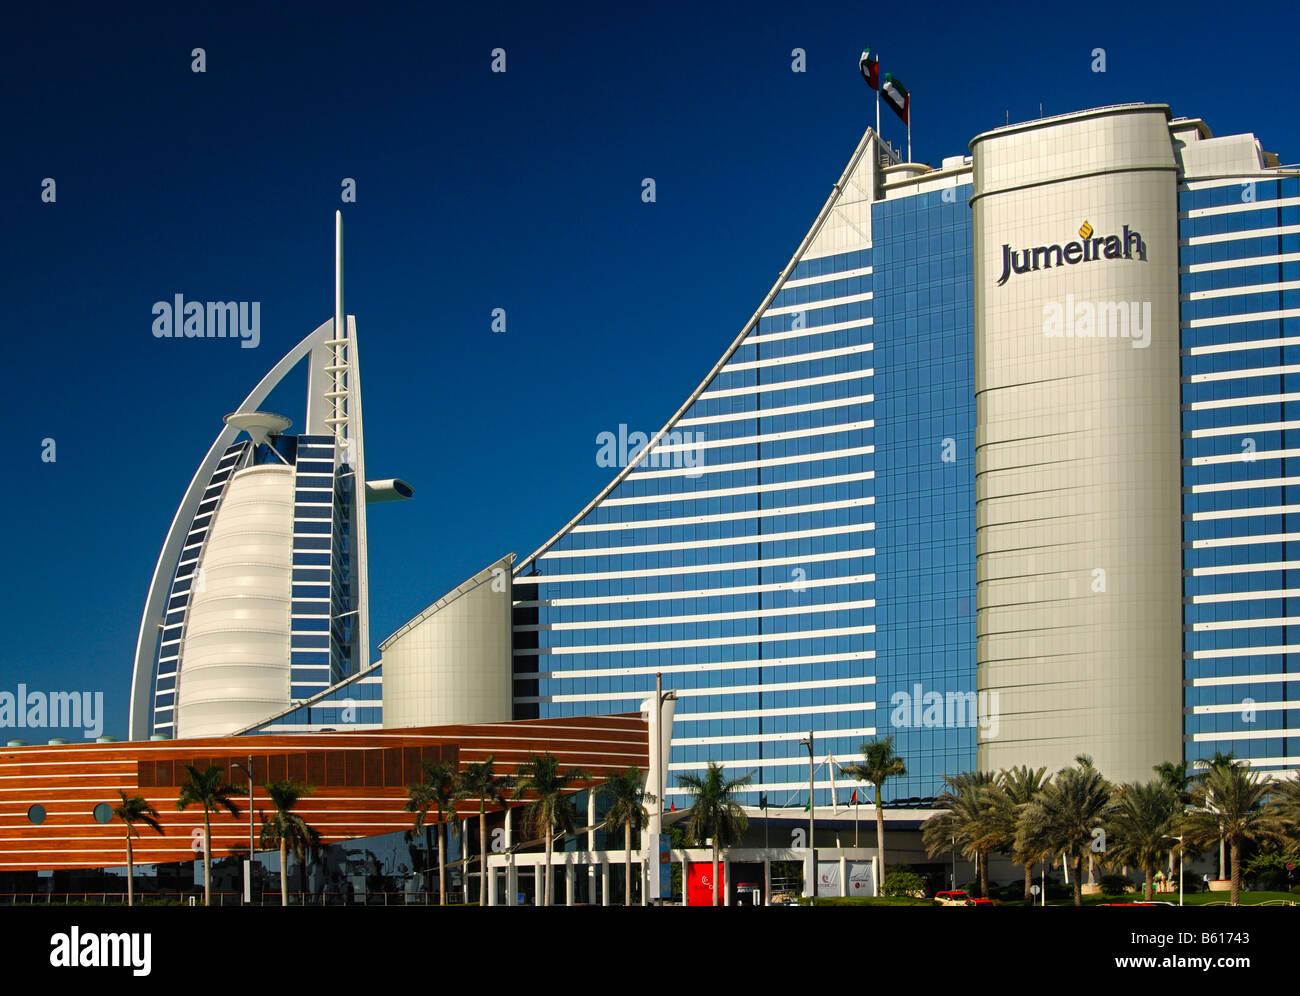 Hotel 7 Etoile Dubai 7 étoiles burj al arab et le jumeirah beach hotel, dubai, Émirats